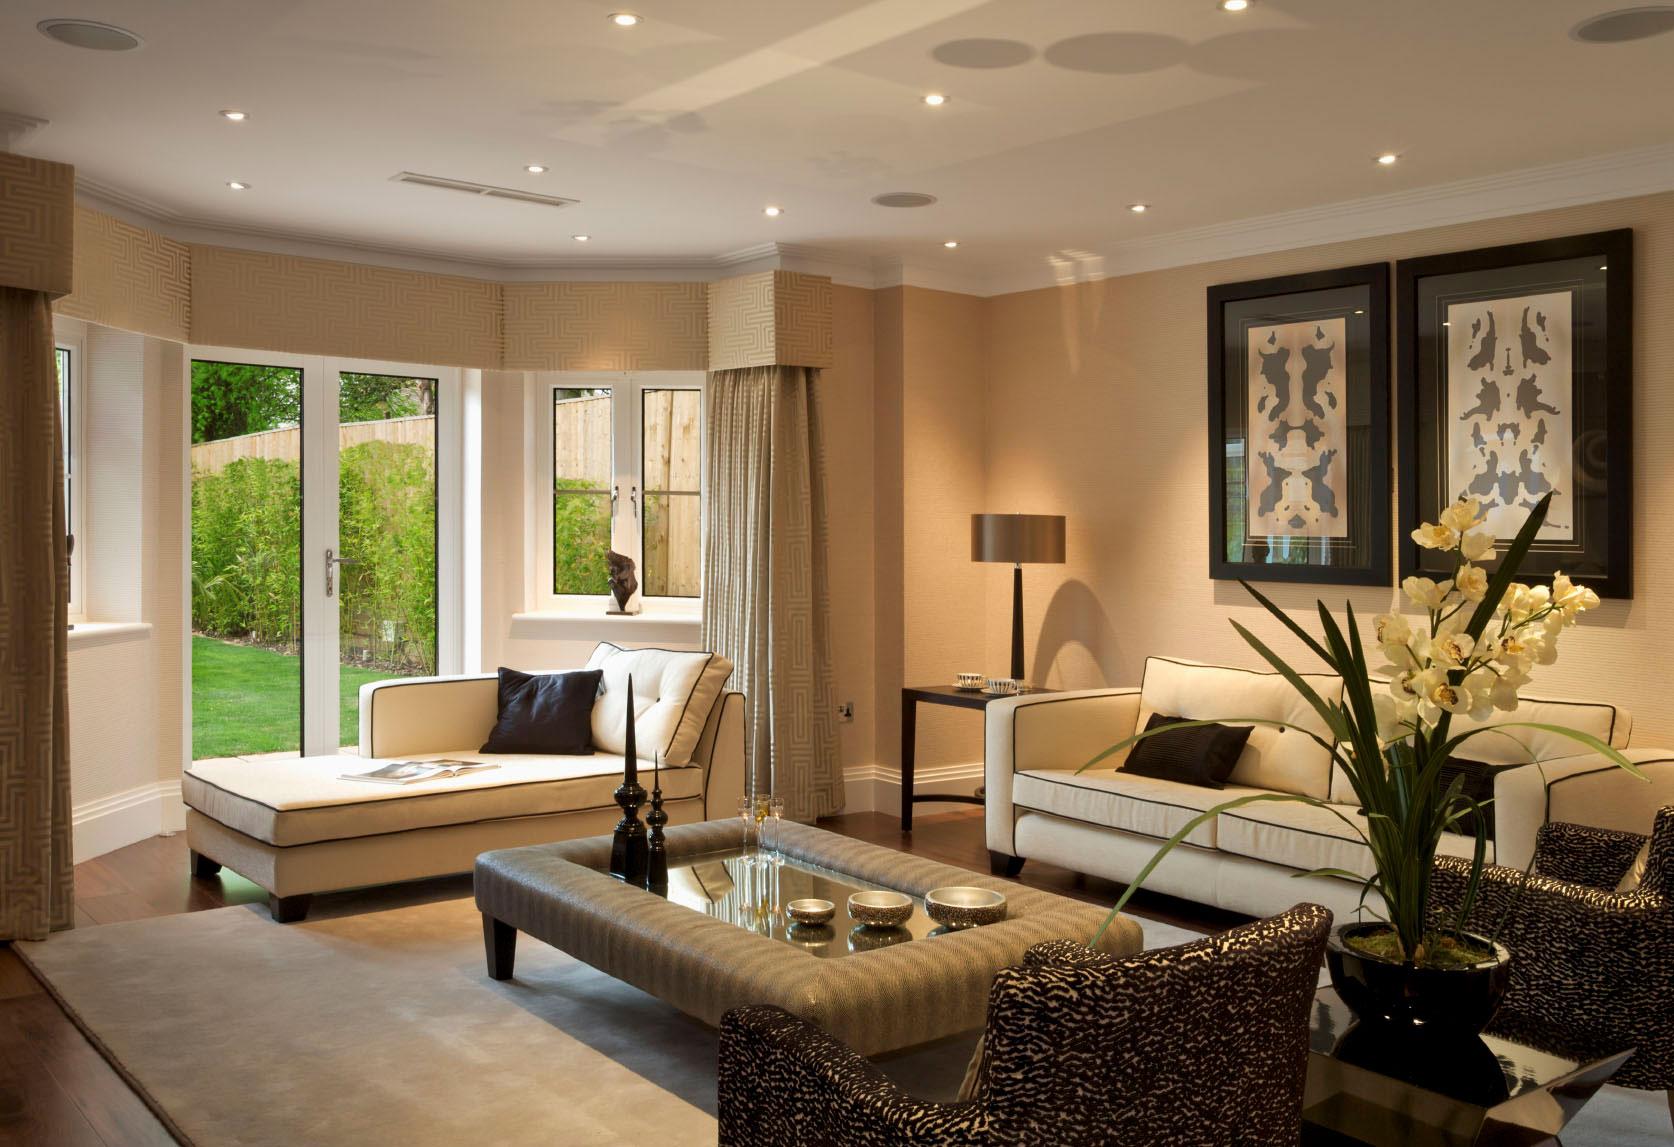 Art Nouveau-interior-design-with-its-style-decor-and-colors-7 Art Nouveau-interior design with its style, decor and colors